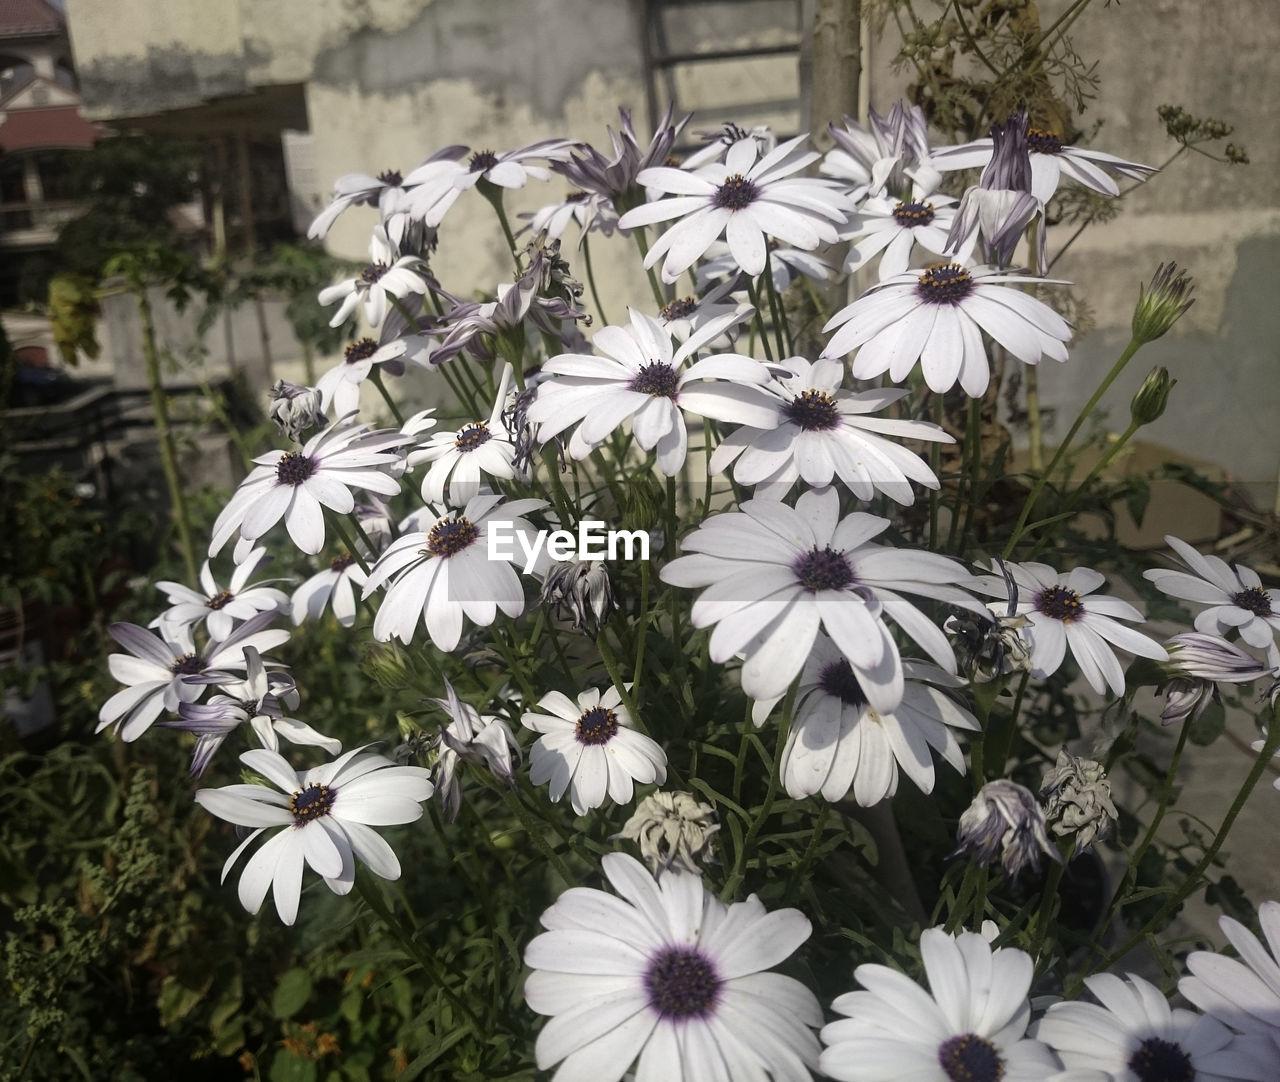 Osteospermum flowers growing outdoors